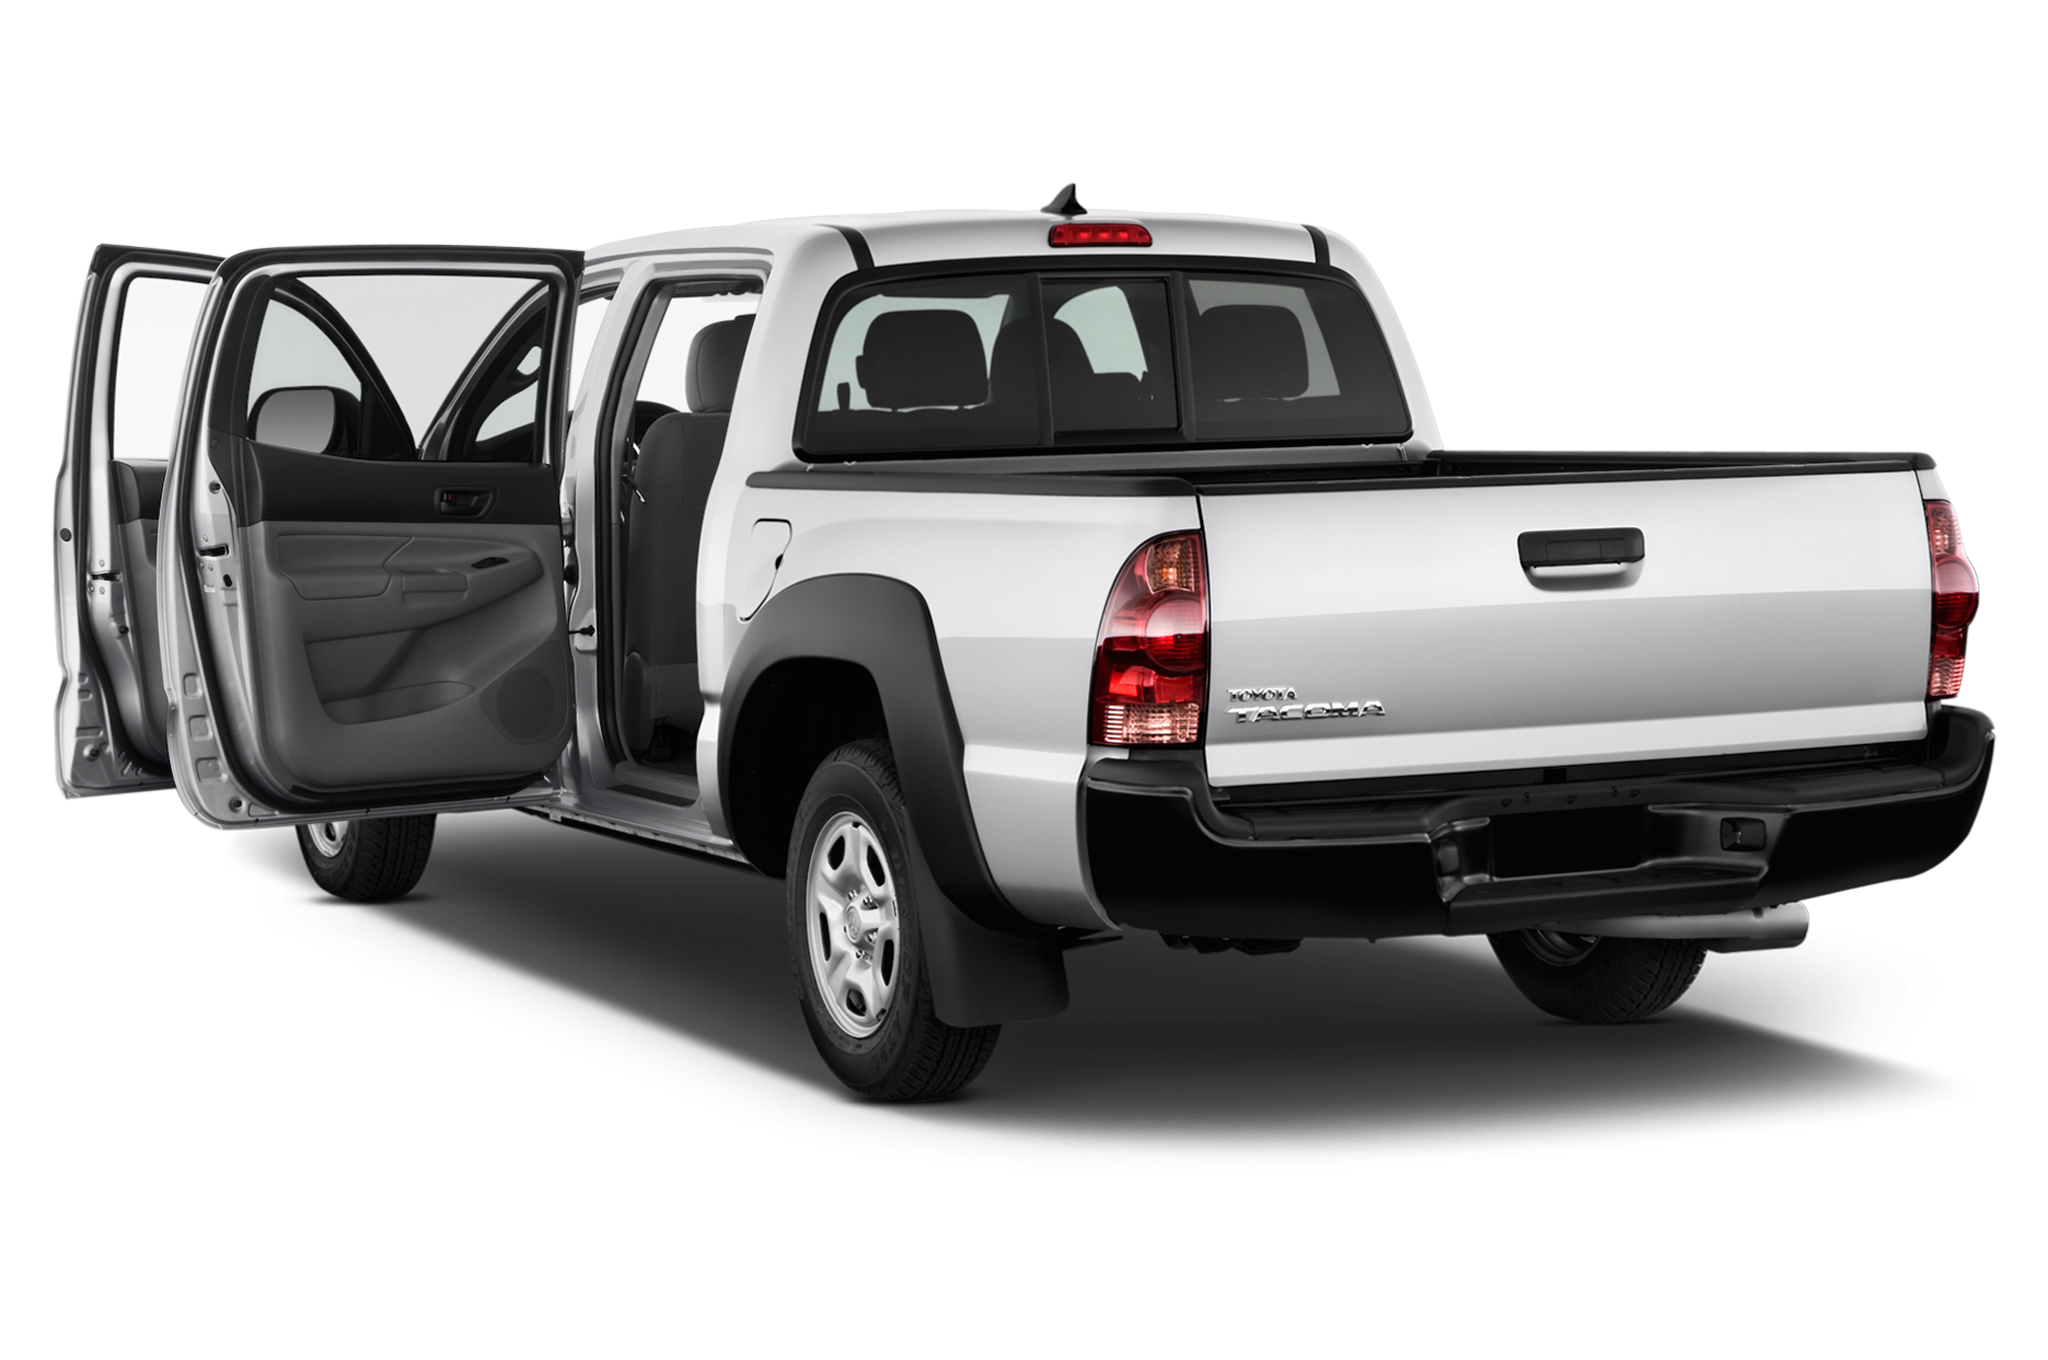 Cars In Pakistan 2018   Hamariweb.com